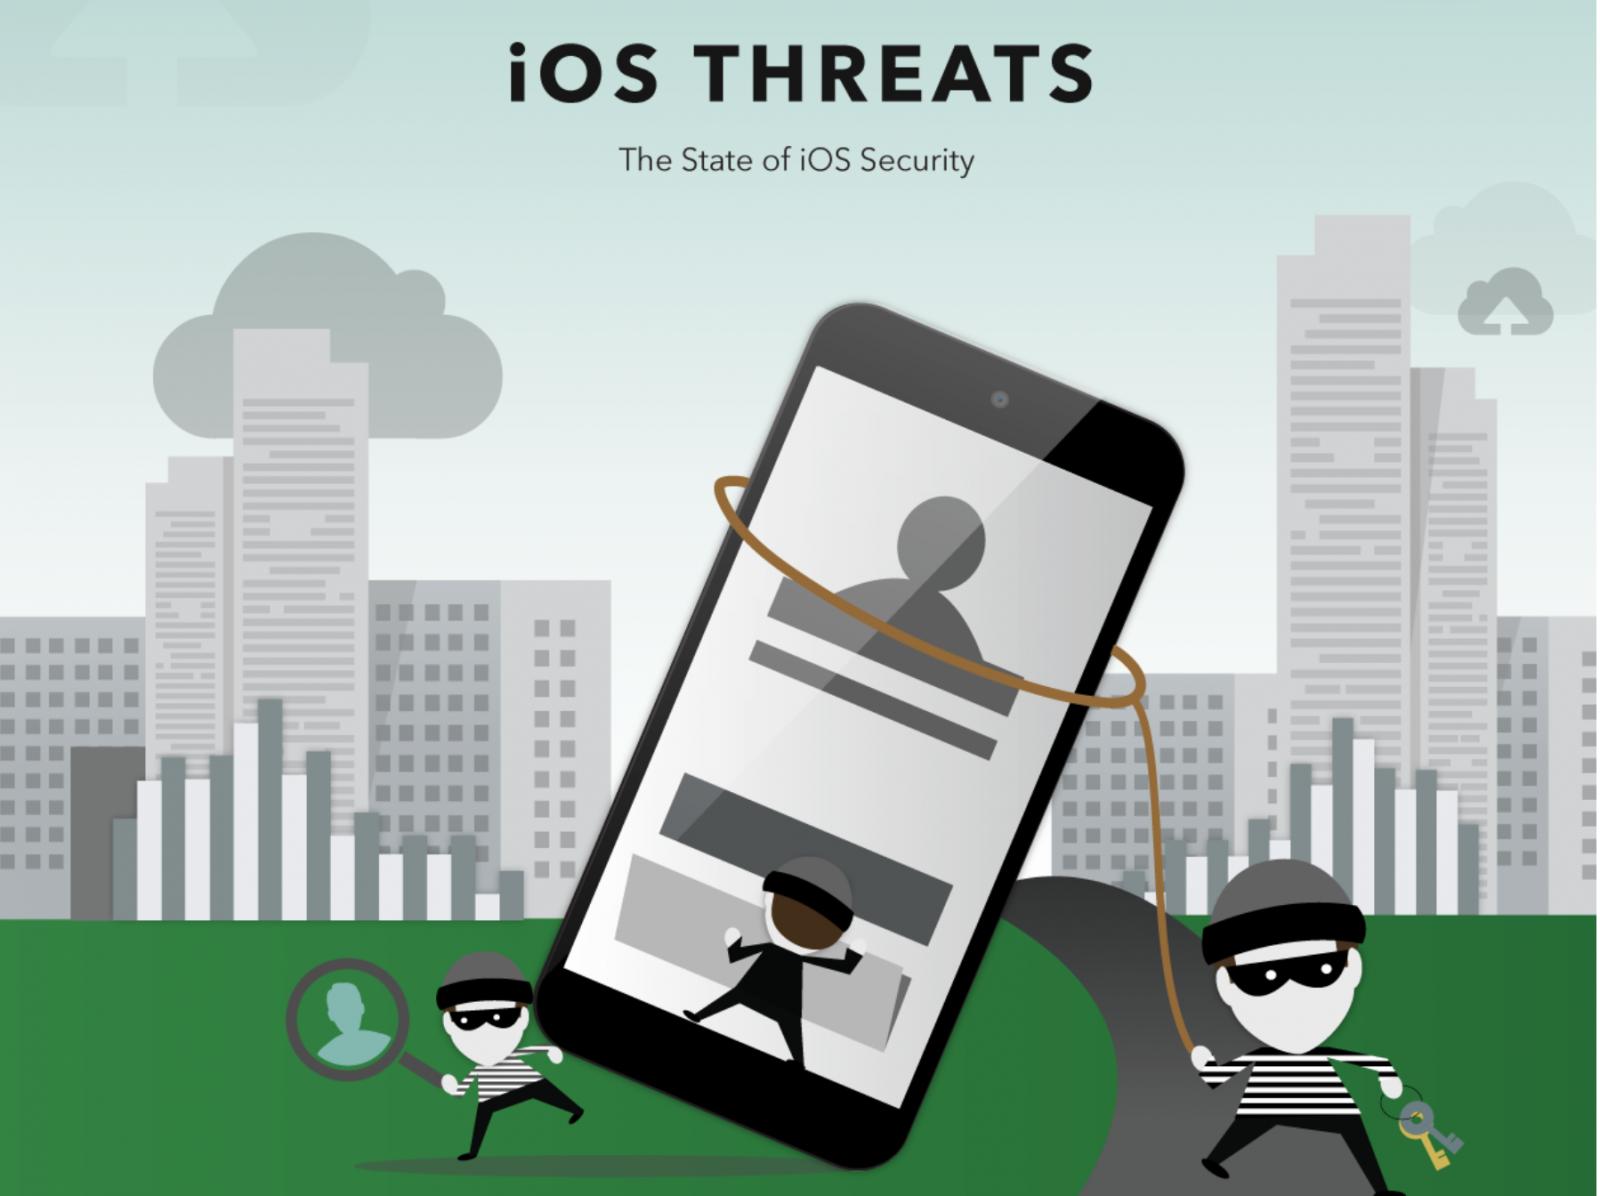 iOS malware threats will emerge in 2015